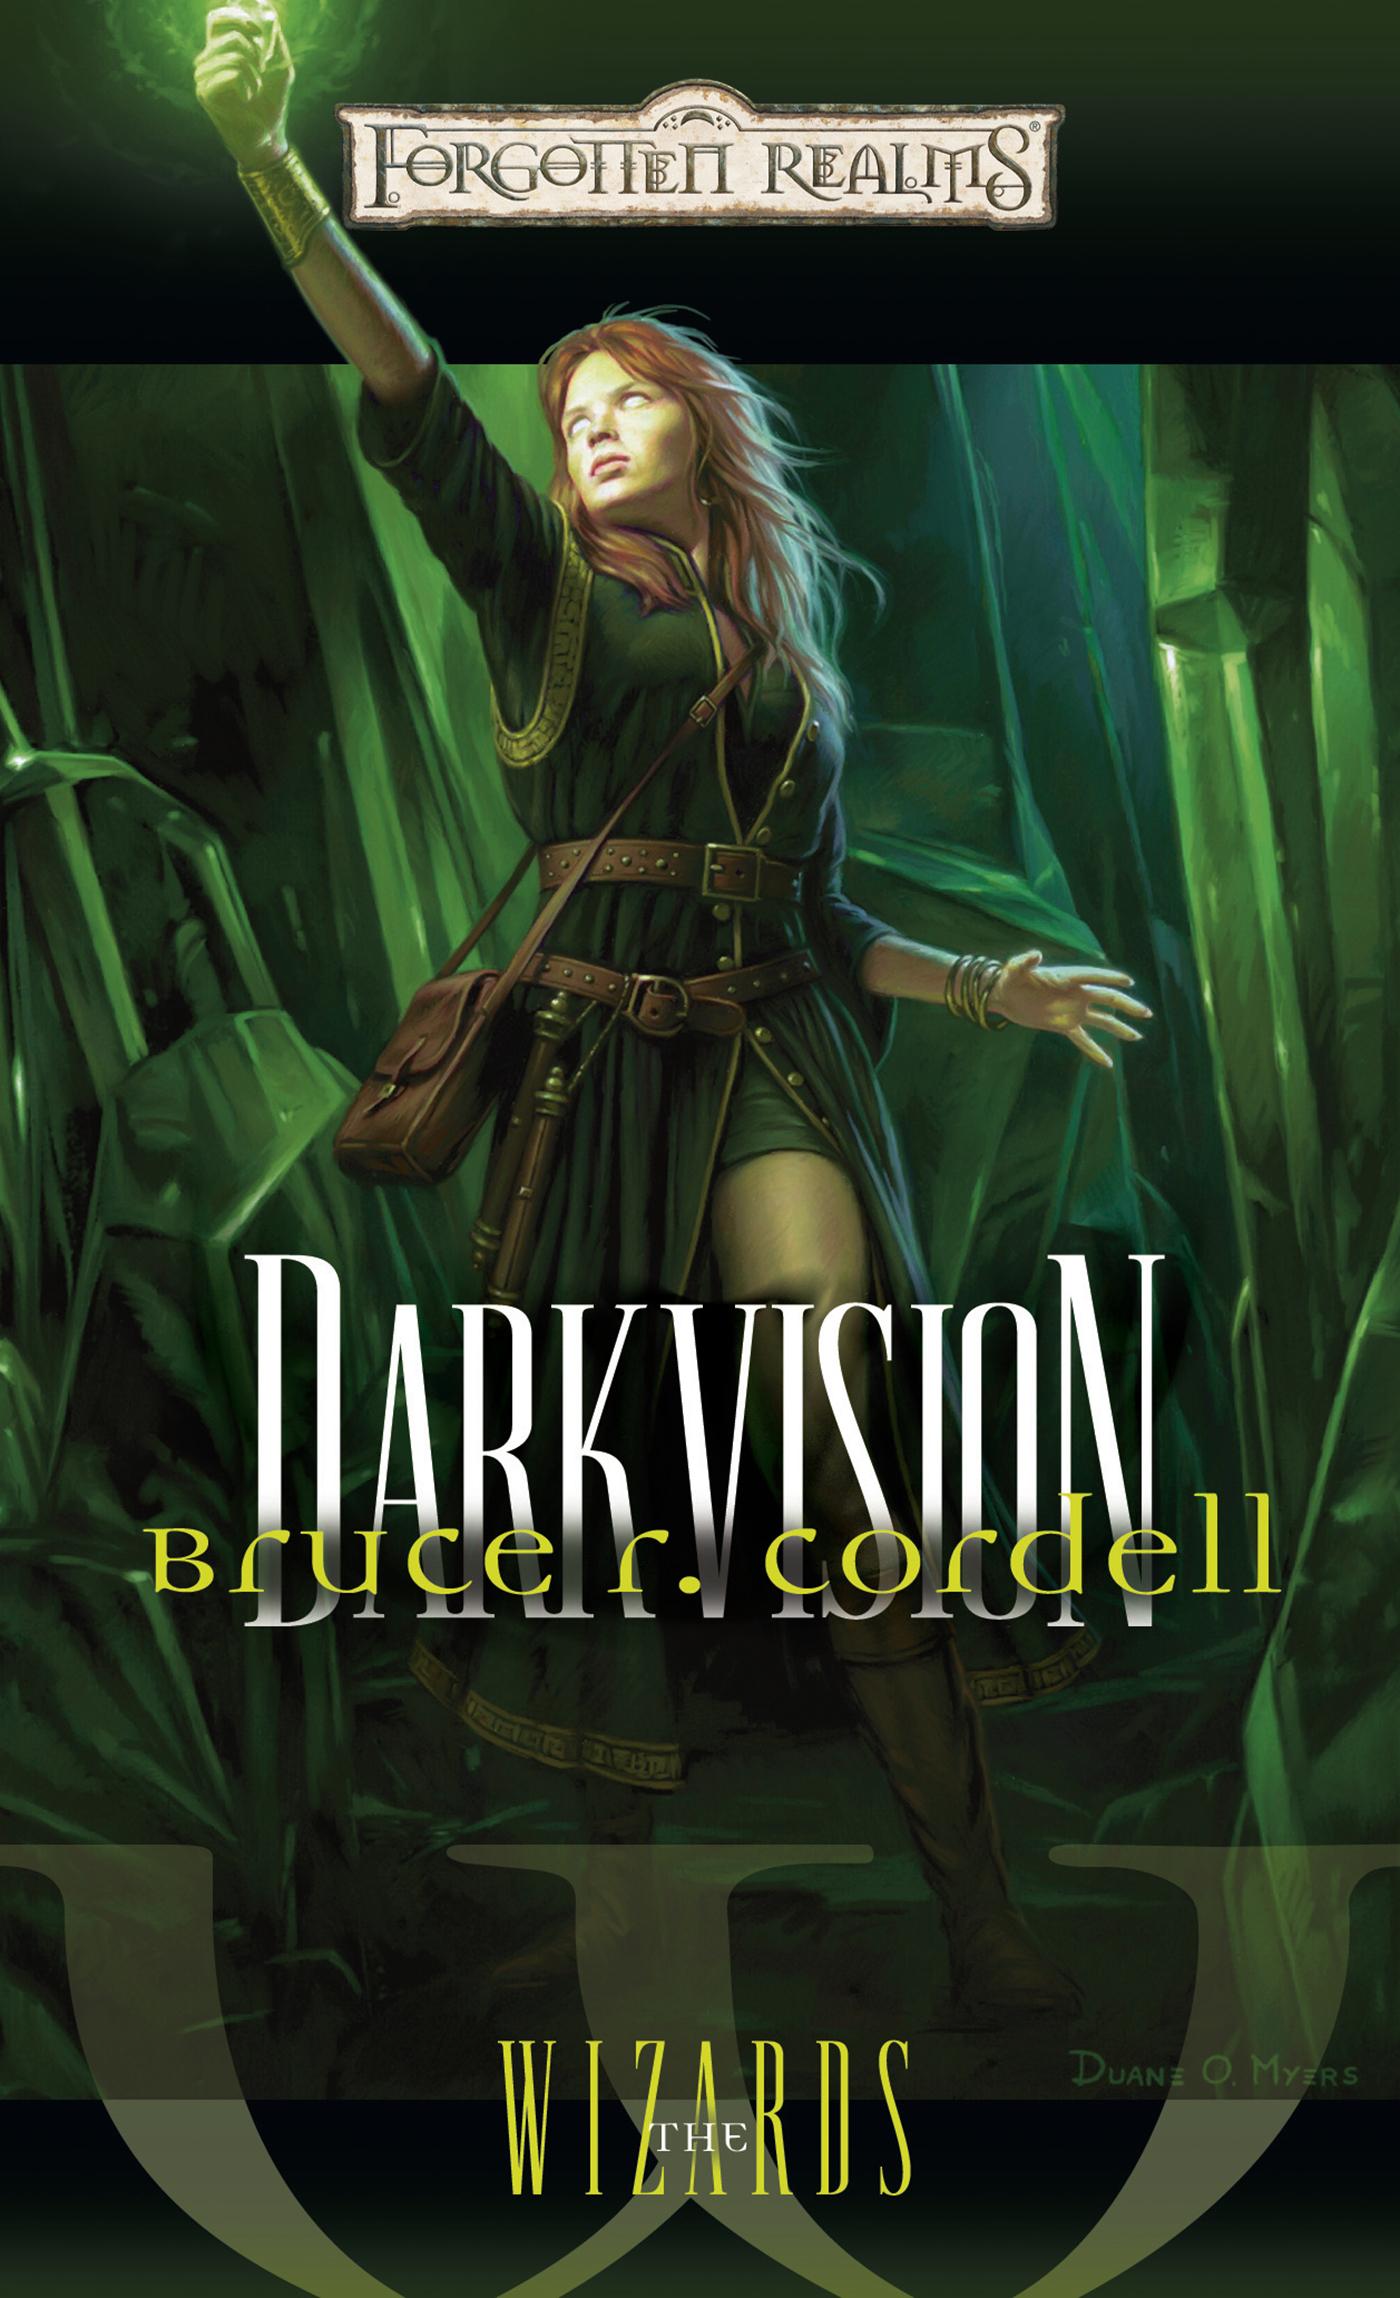 Darkvision (novel)